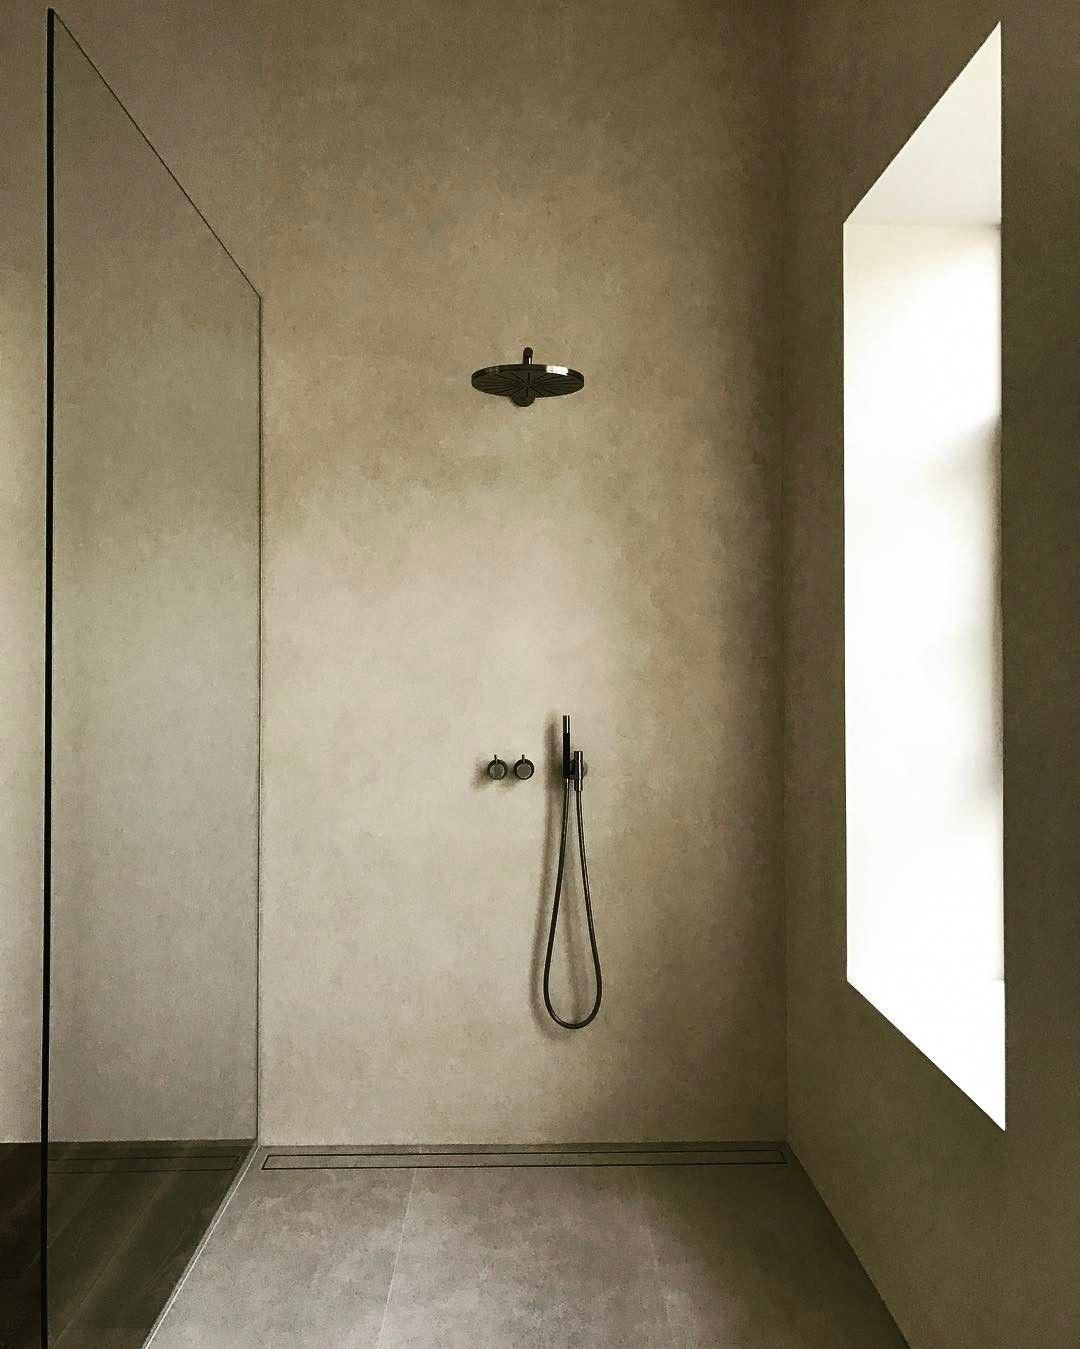 Luxury Bathroom Showroom In Glasgow Dreambathroomsluxury Luxurybathroomsglasgow Luxuryb Simple Bathroom Designs Contemporary Bathrooms Simple Bathroom Decor